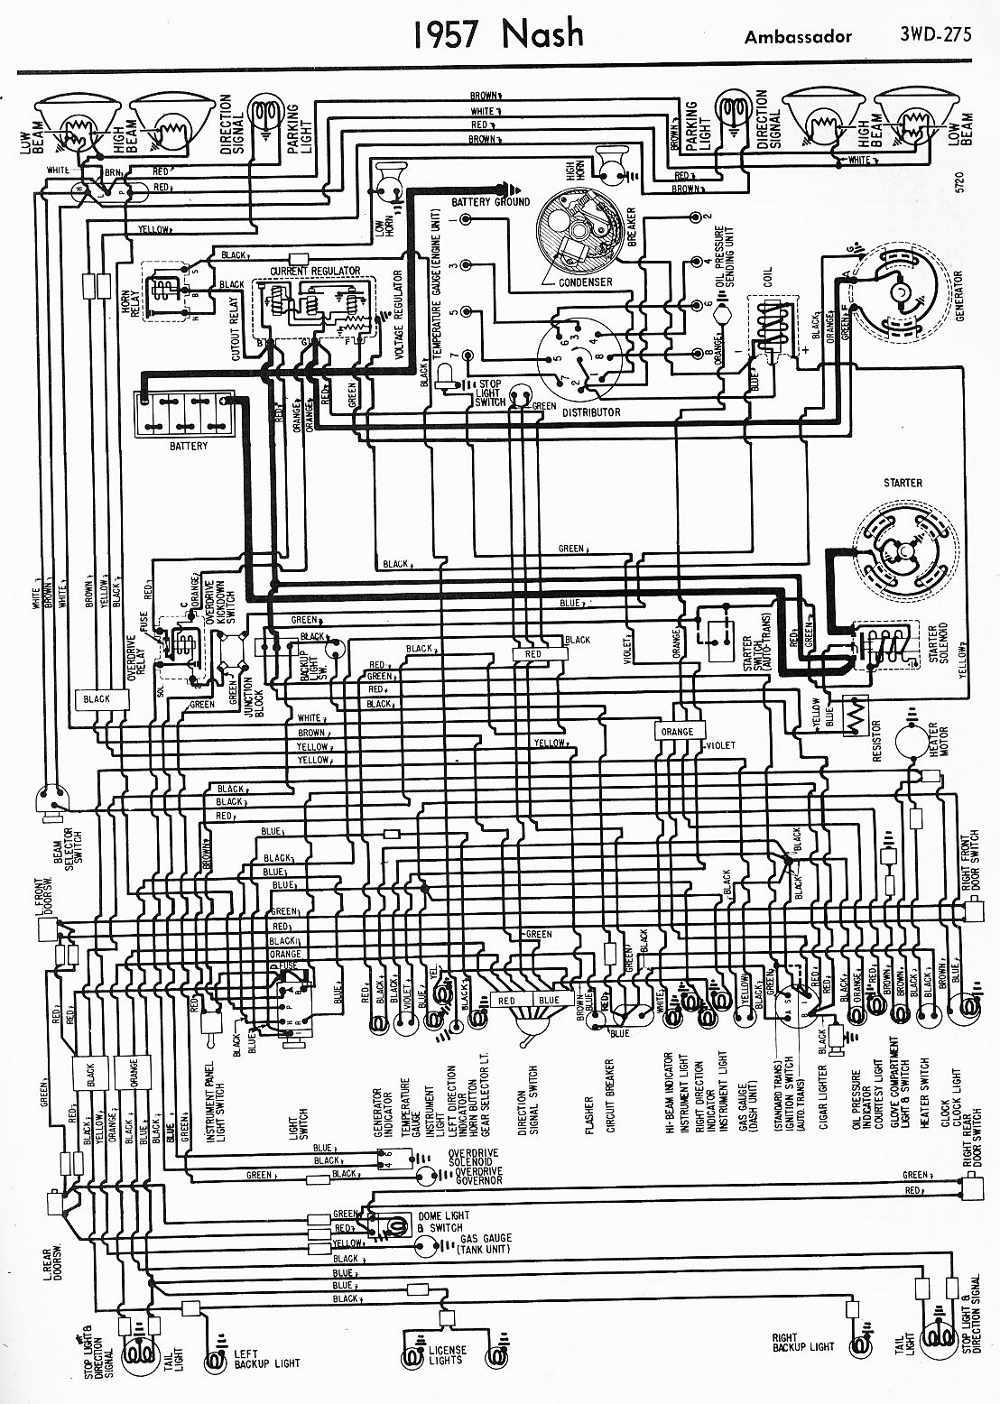 wiring-diagrams-of-1957-nash-ambador Wiring Diagram For Nash Metropolitan on back seat, convertible blue, car clubs, hood ornament, pic custom, cars sale, street rod, parts car, drag cars,